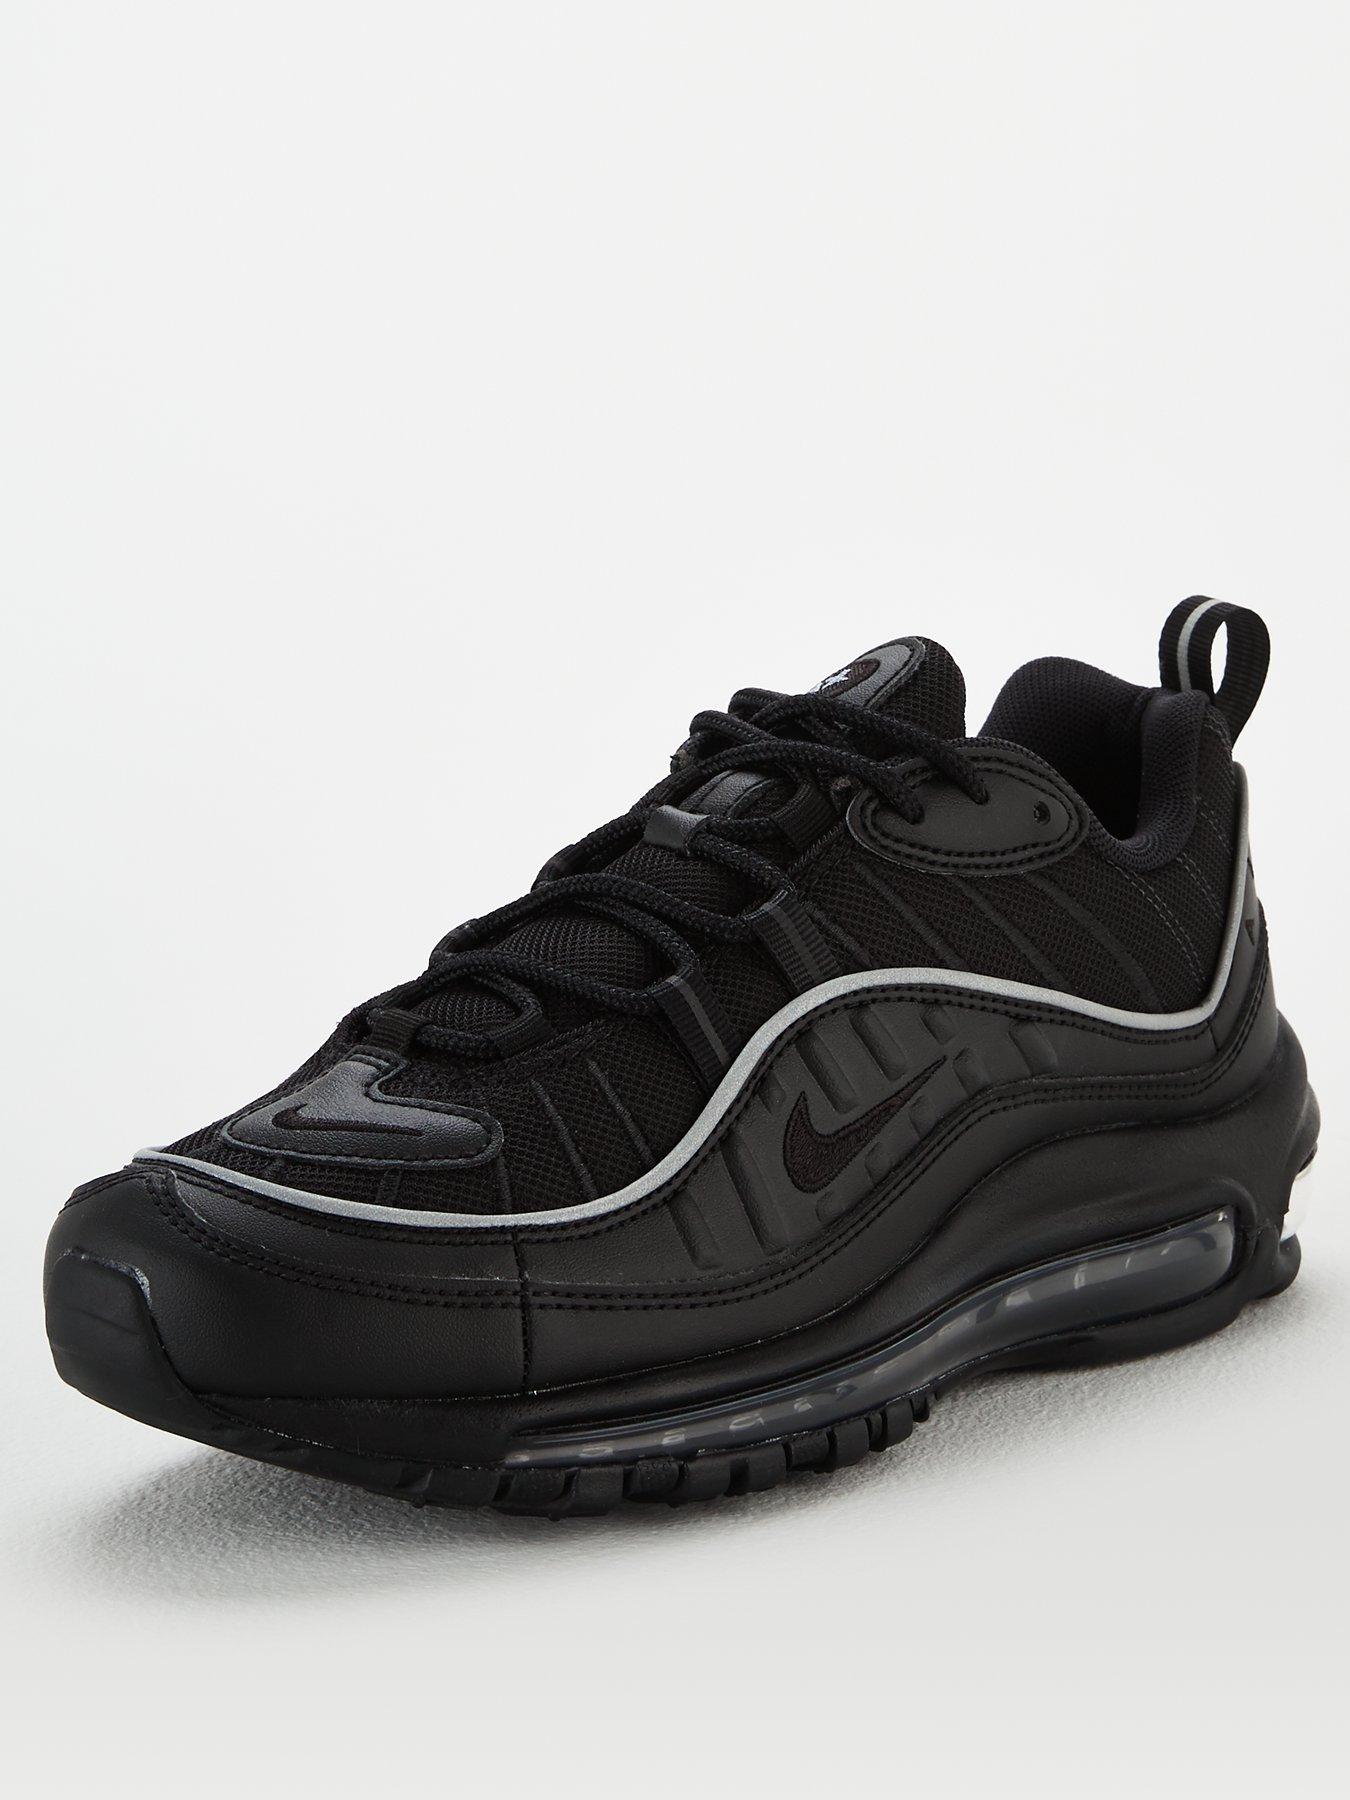 black air max 98